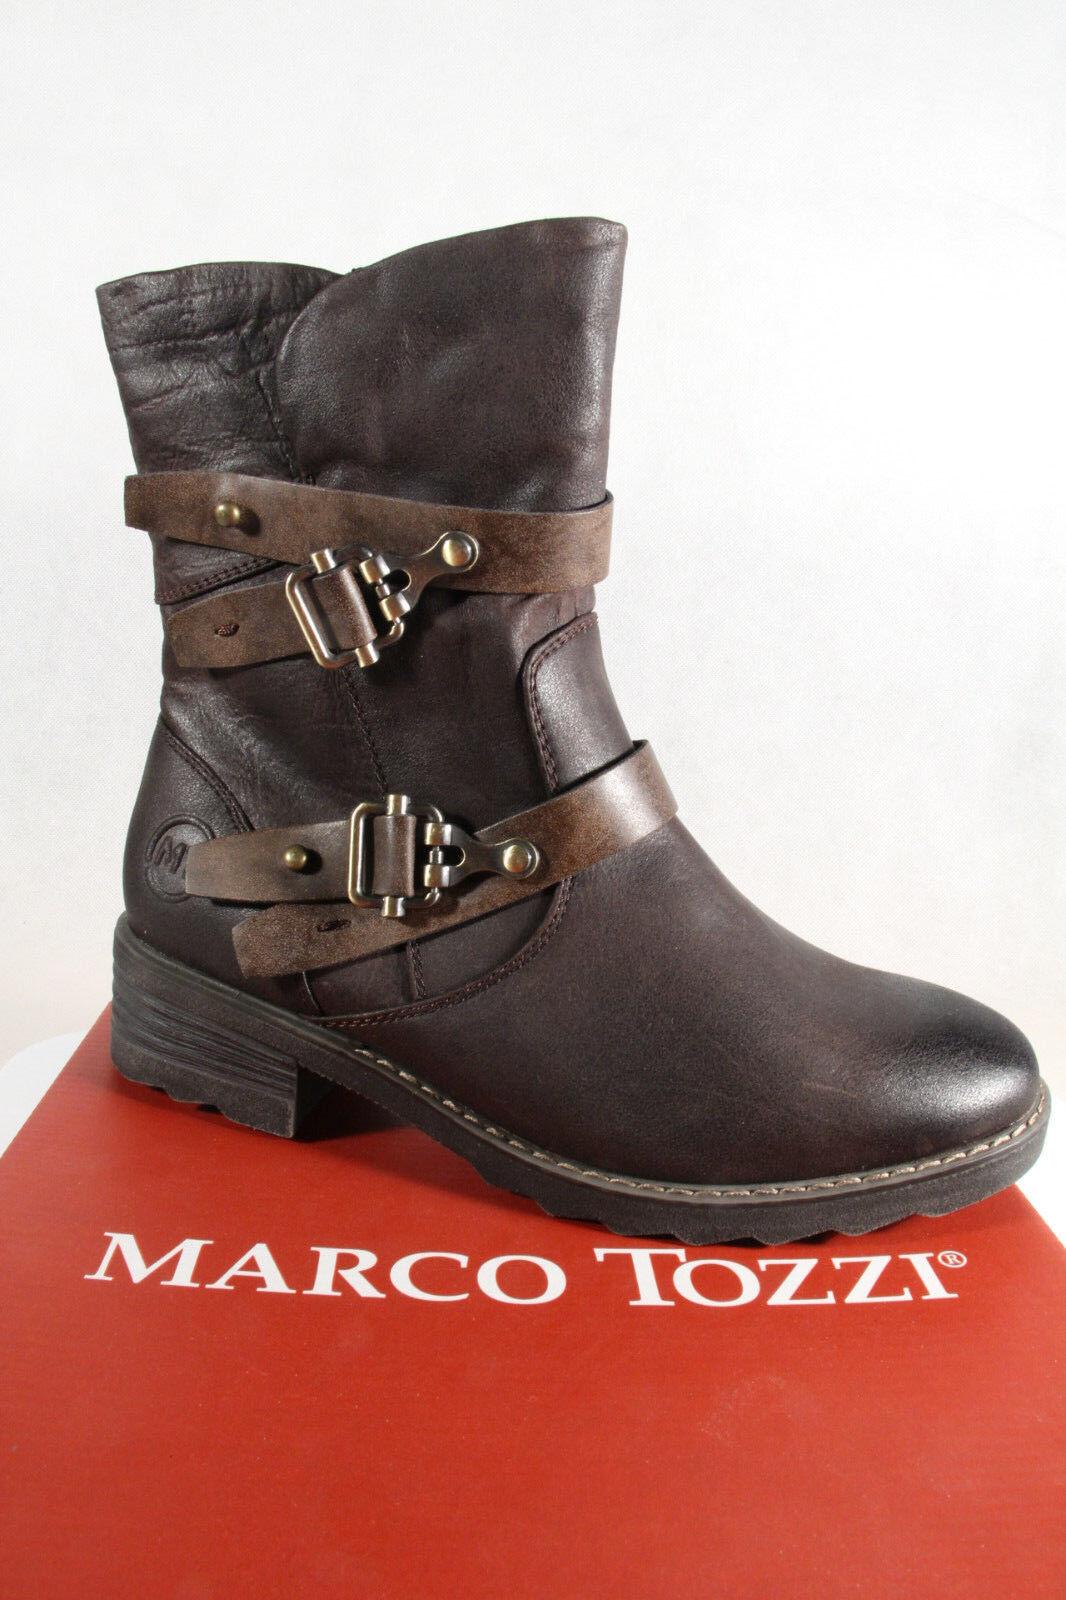 the best attitude d4aea e280e Marco Tozzi Stiefel, Stiefelette, braun, warm gefüttert, RV 26432 NEU!!